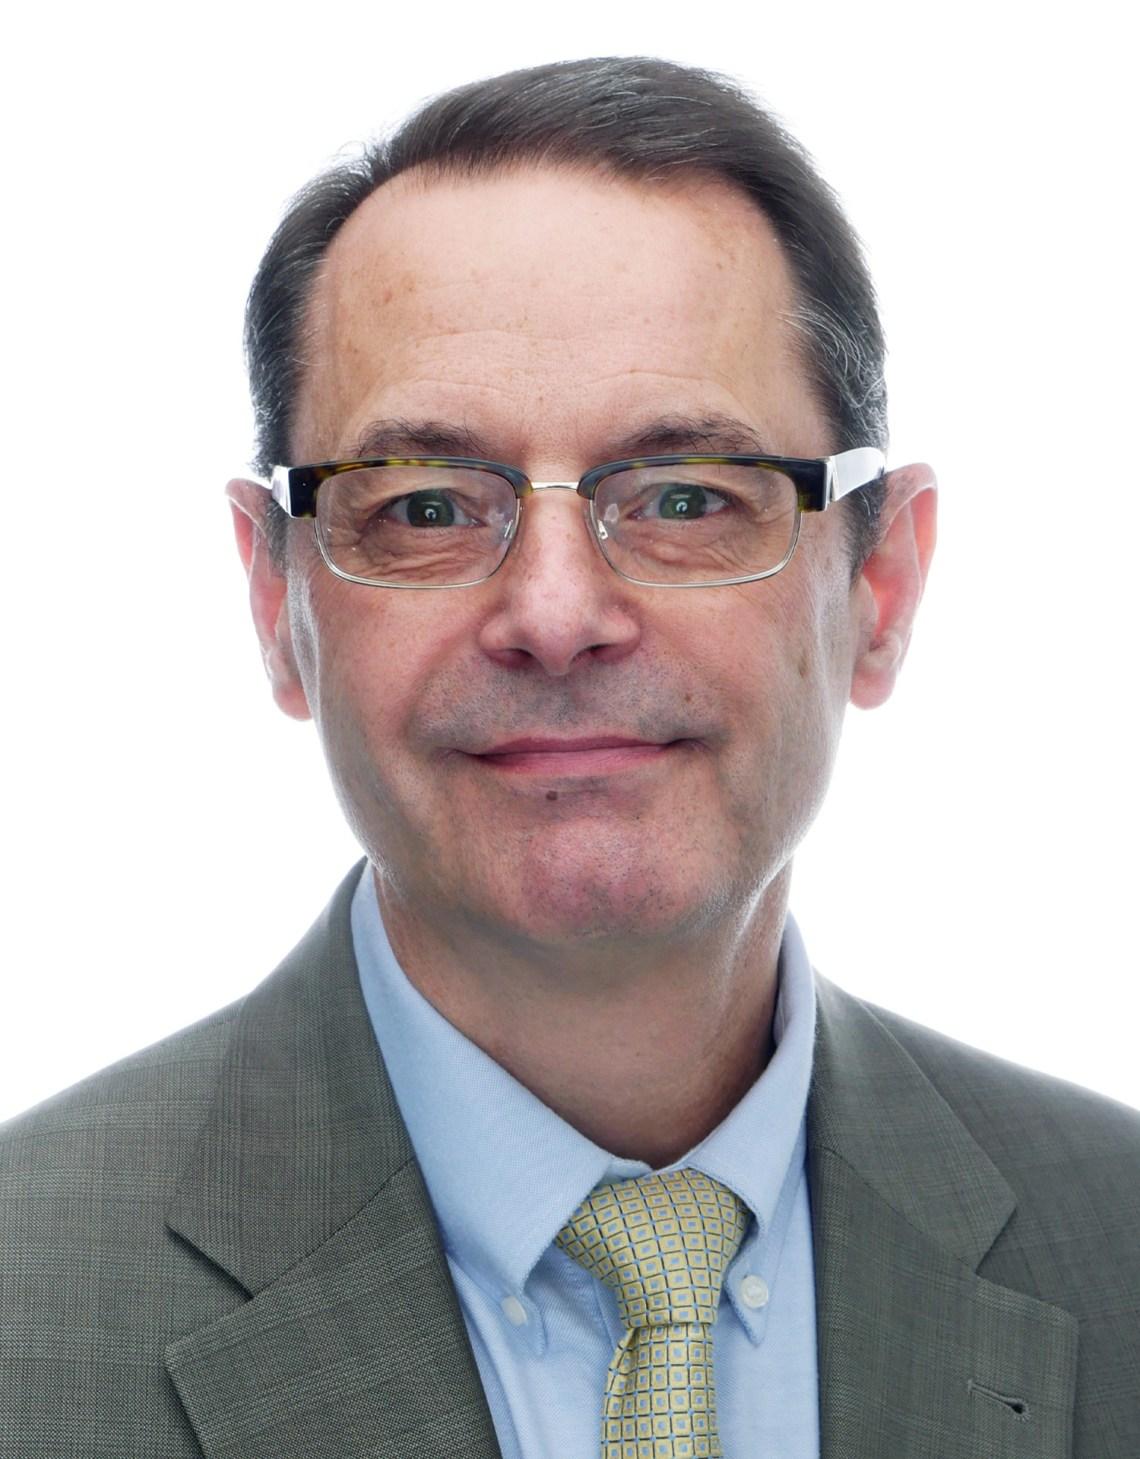 Doug Stilwell